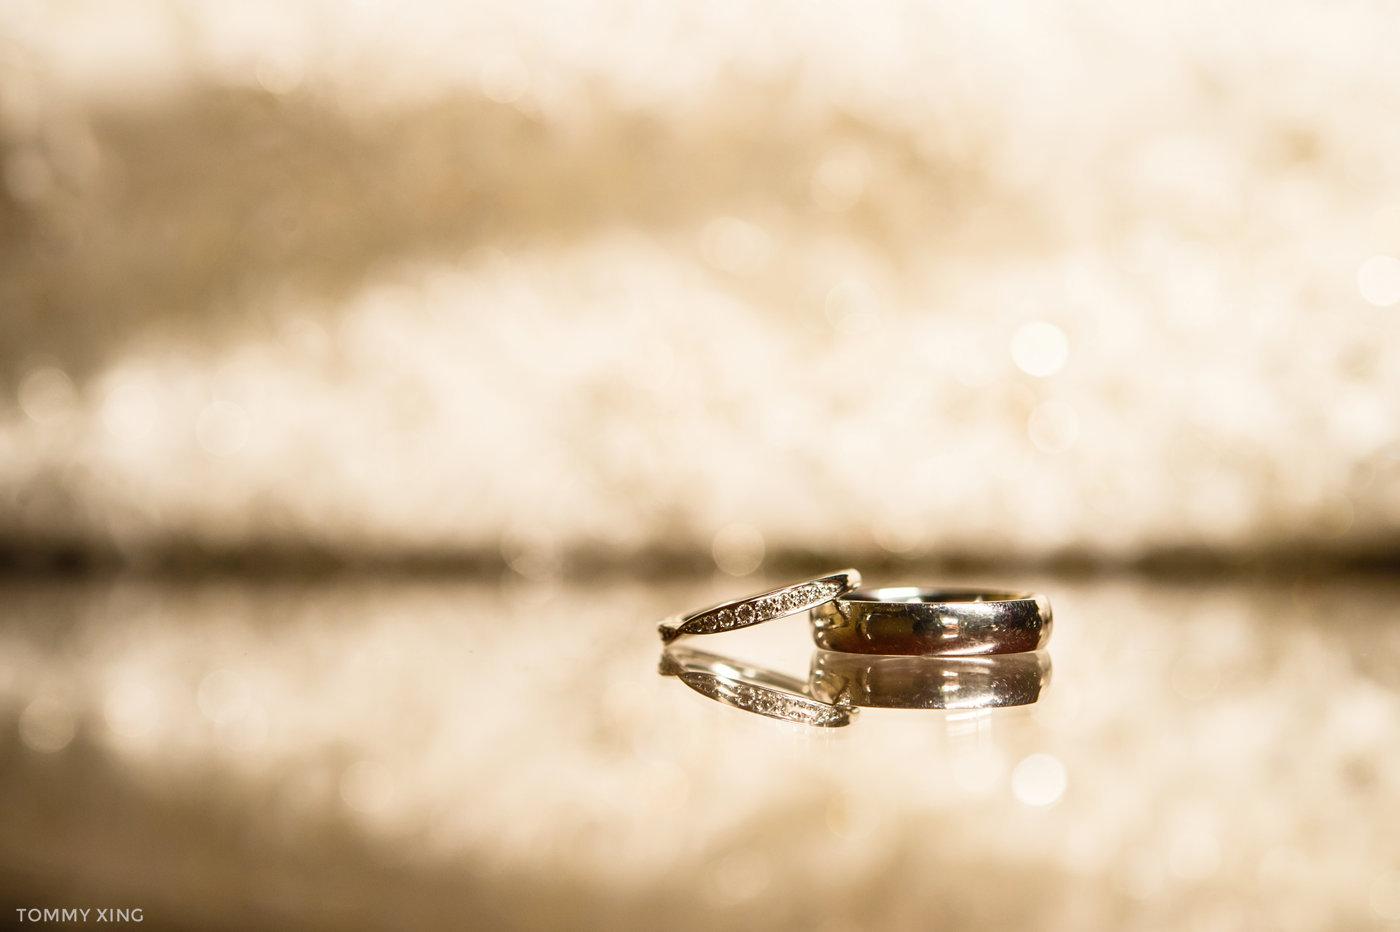 STANFORD MEMORIAL CHURCH WEDDING - Wenjie & Chengcheng - SAN FRANCISCO BAY AREA 斯坦福教堂婚礼跟拍 - 洛杉矶婚礼婚纱照摄影师 Tommy Xing Photography021.jpg